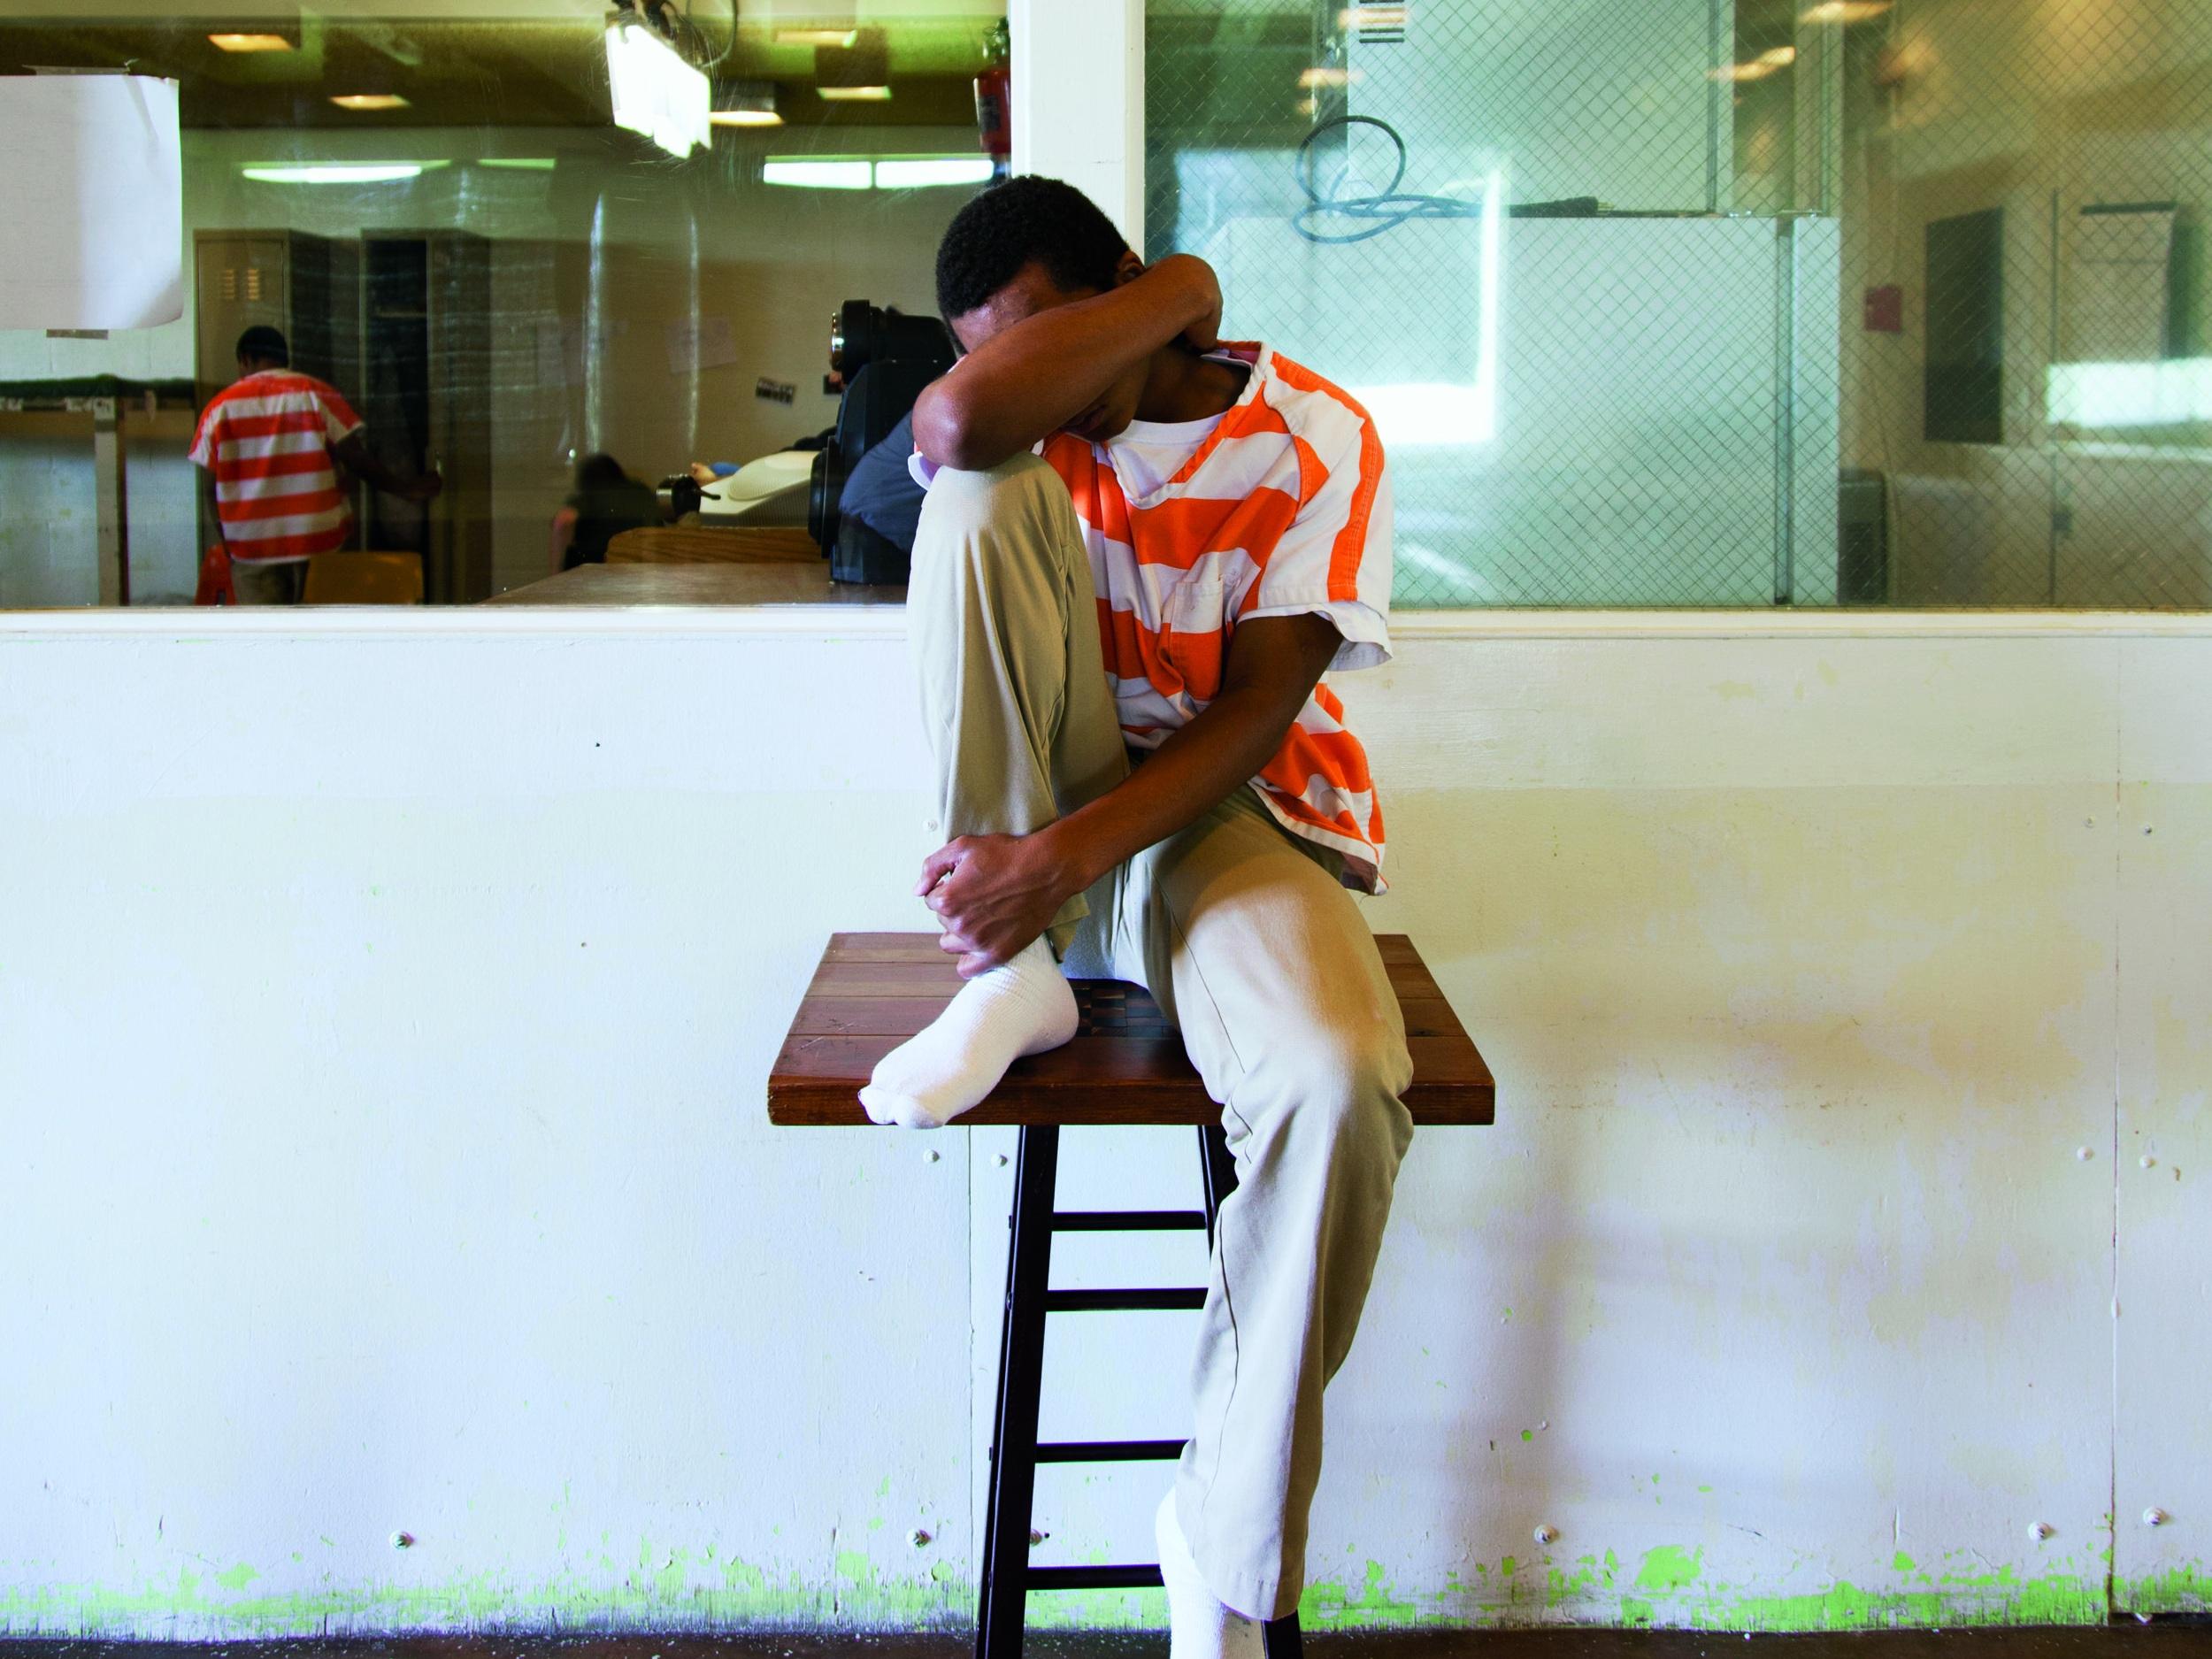 6. LGBTQ - Isolation of incarcerated LGBTQ youth